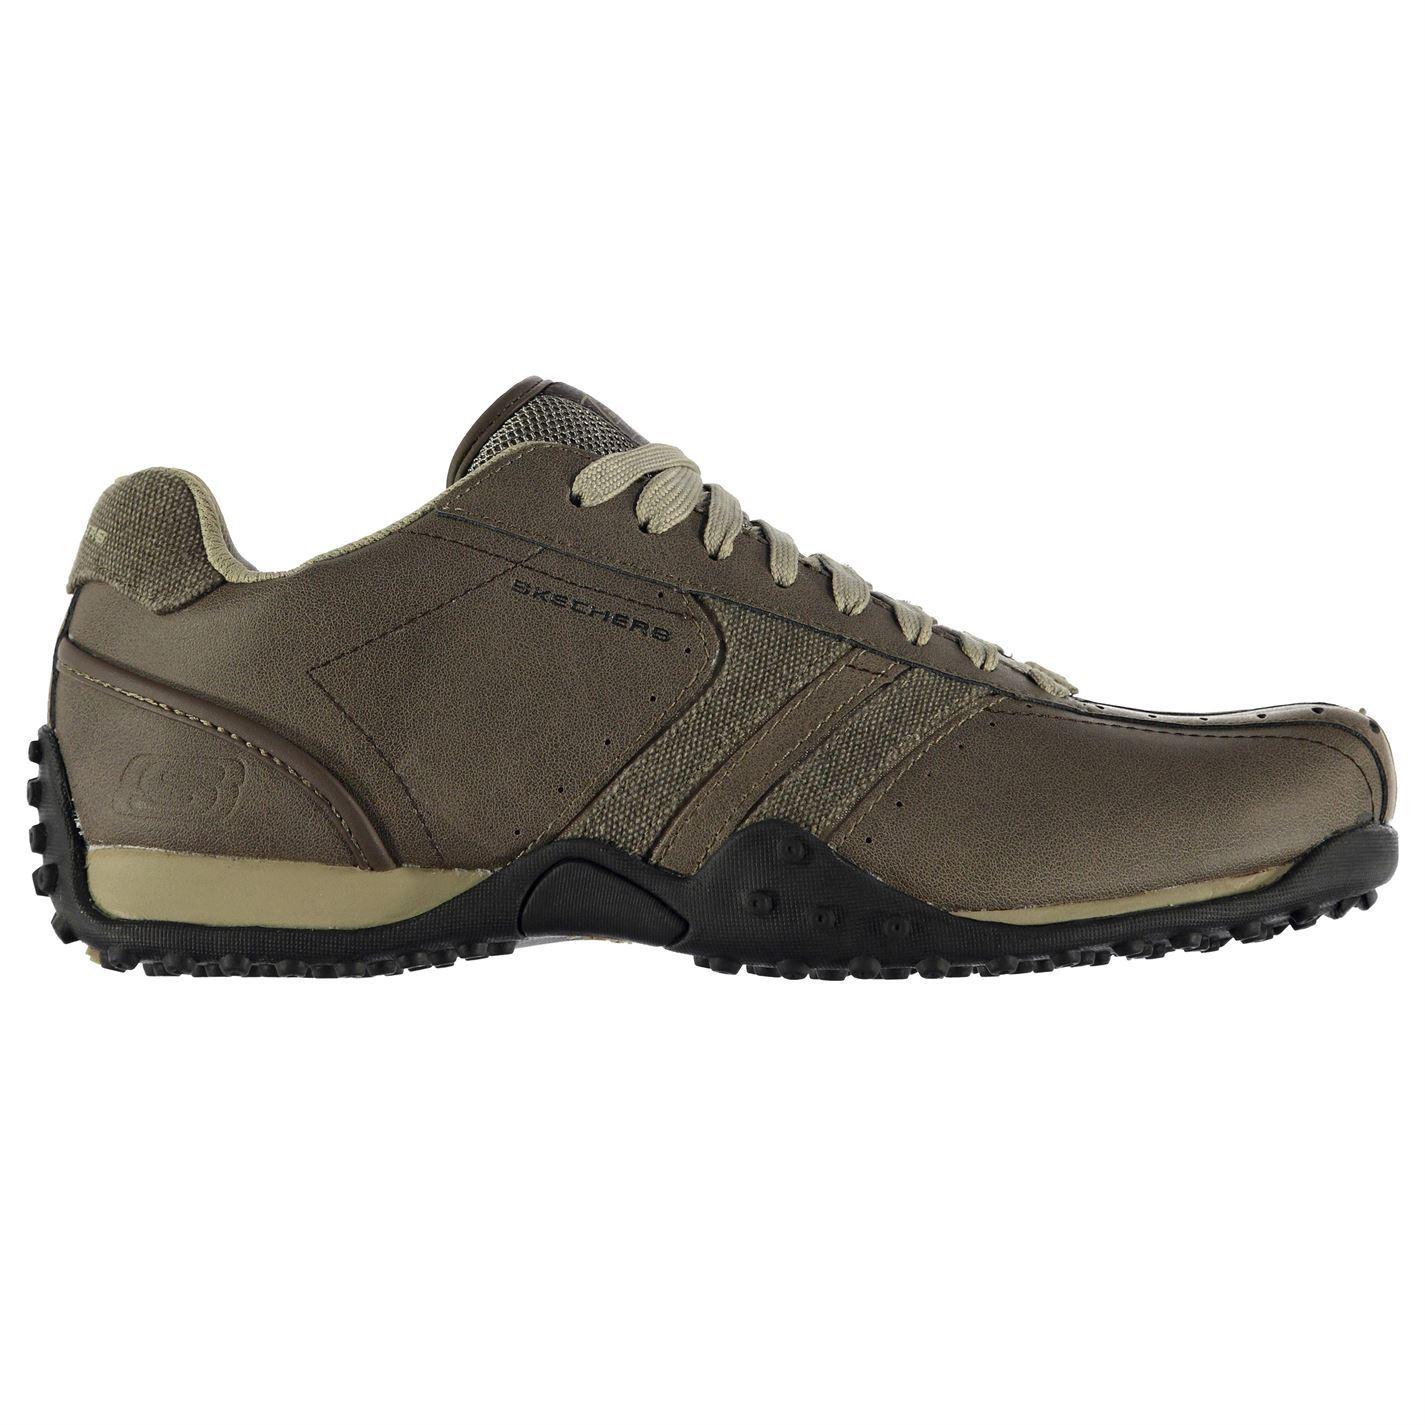 Skechers-Urban-Track-Forward-Trainers-Mens-Athleisure-Footwear-Shoes-Sneakers thumbnail 20